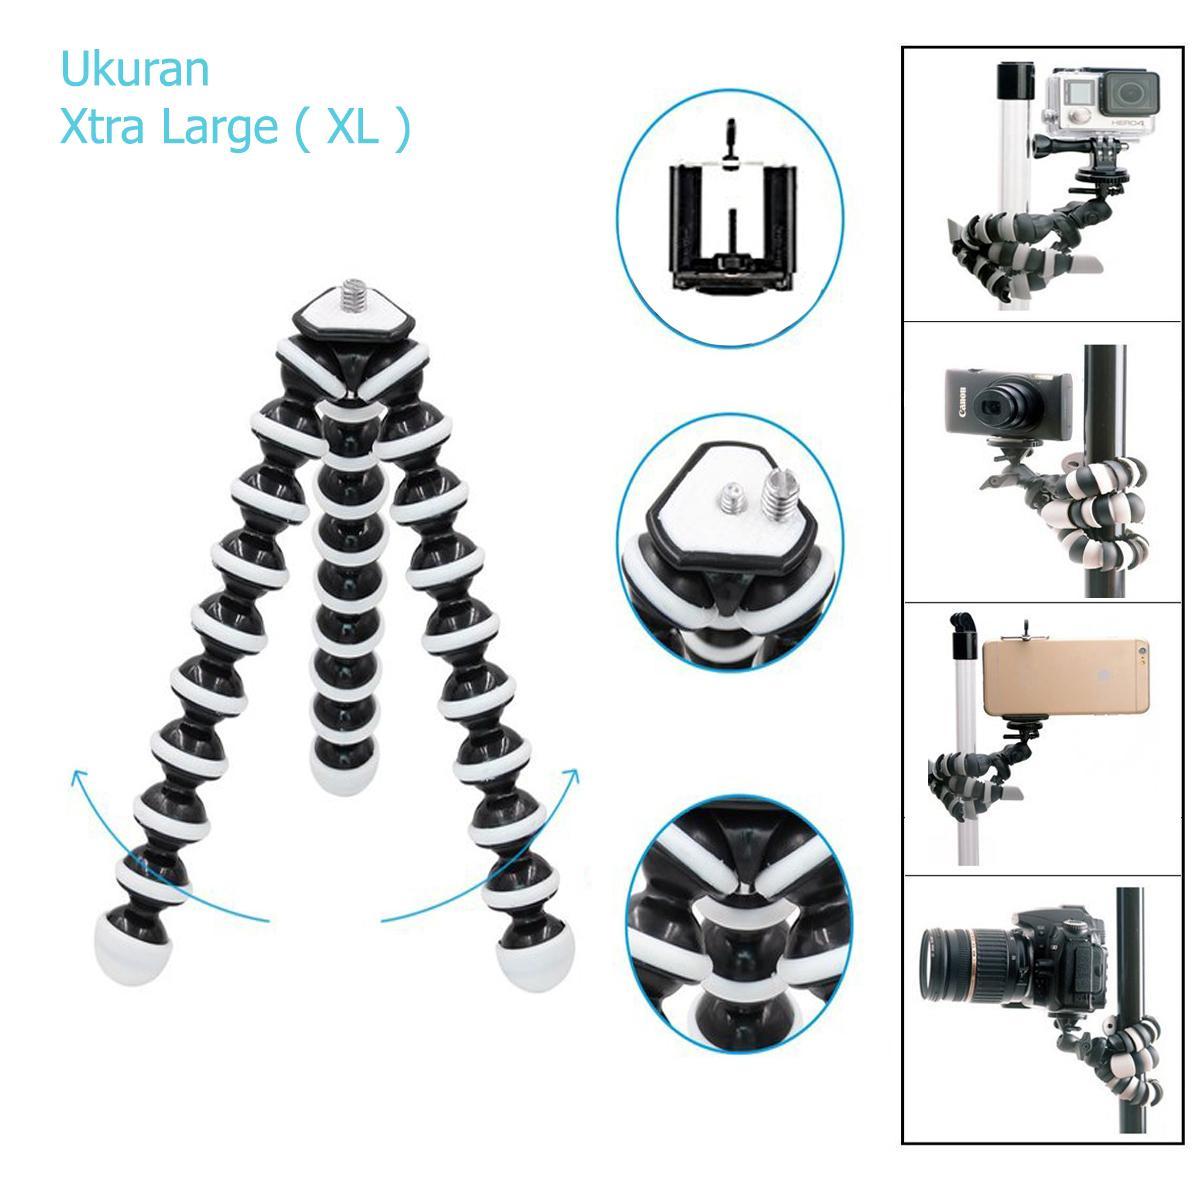 Tripod Camera / Gorilla Pod Tripod For Kamera Dslr Gorillapod Octopus XL Free Holder U